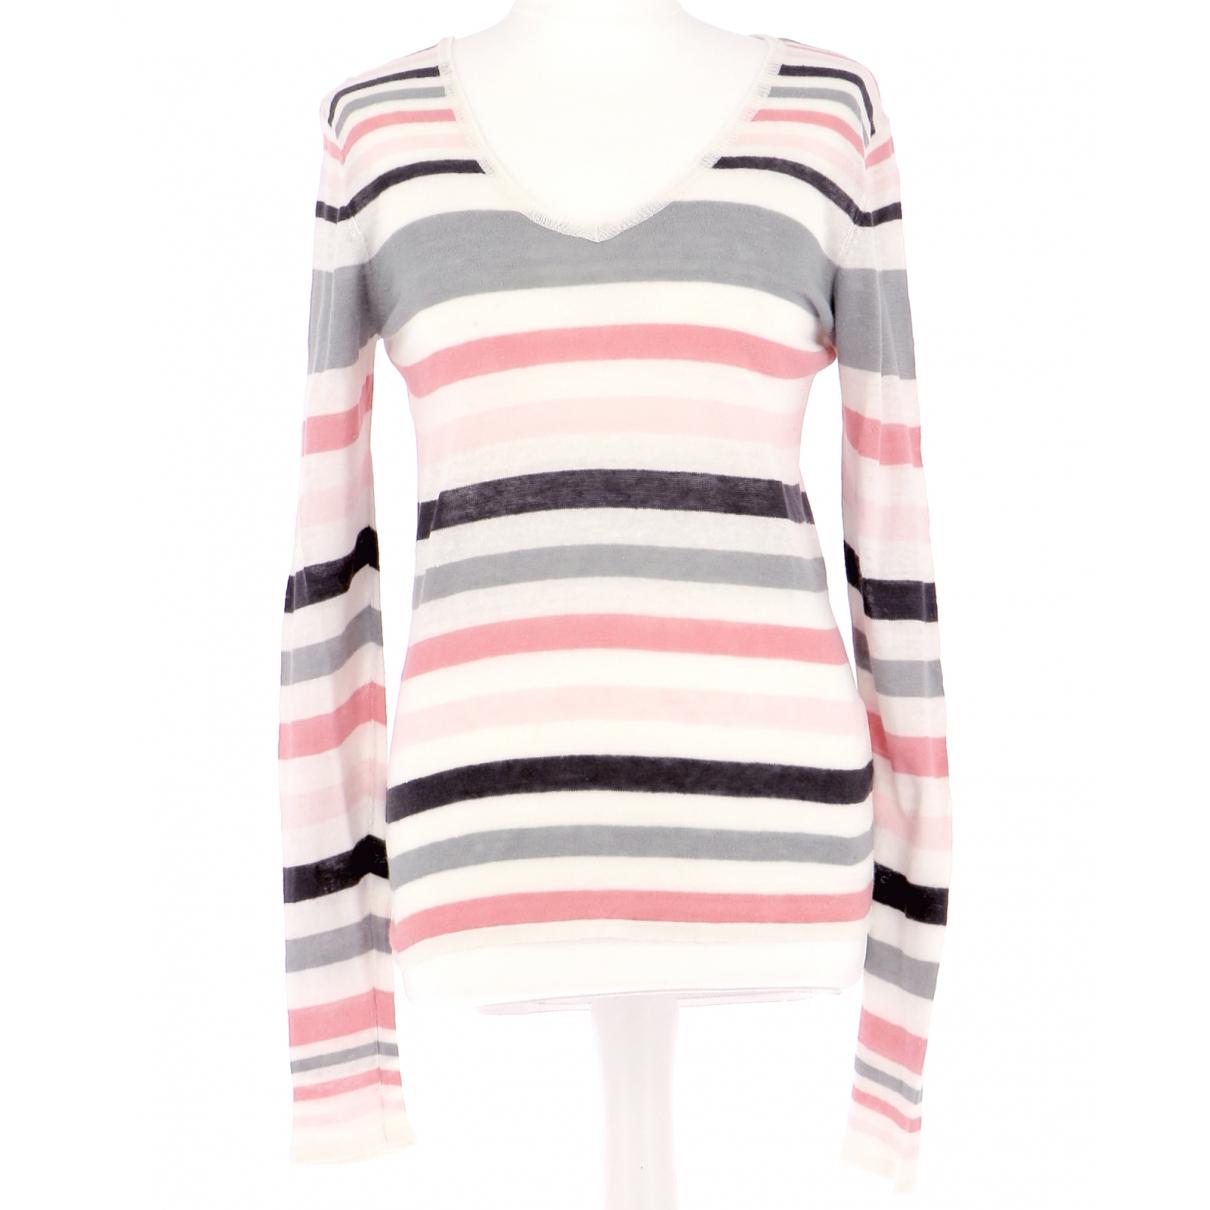 Autre Marque N Multicolour Linen Knitwear & Sweatshirts for Men S International